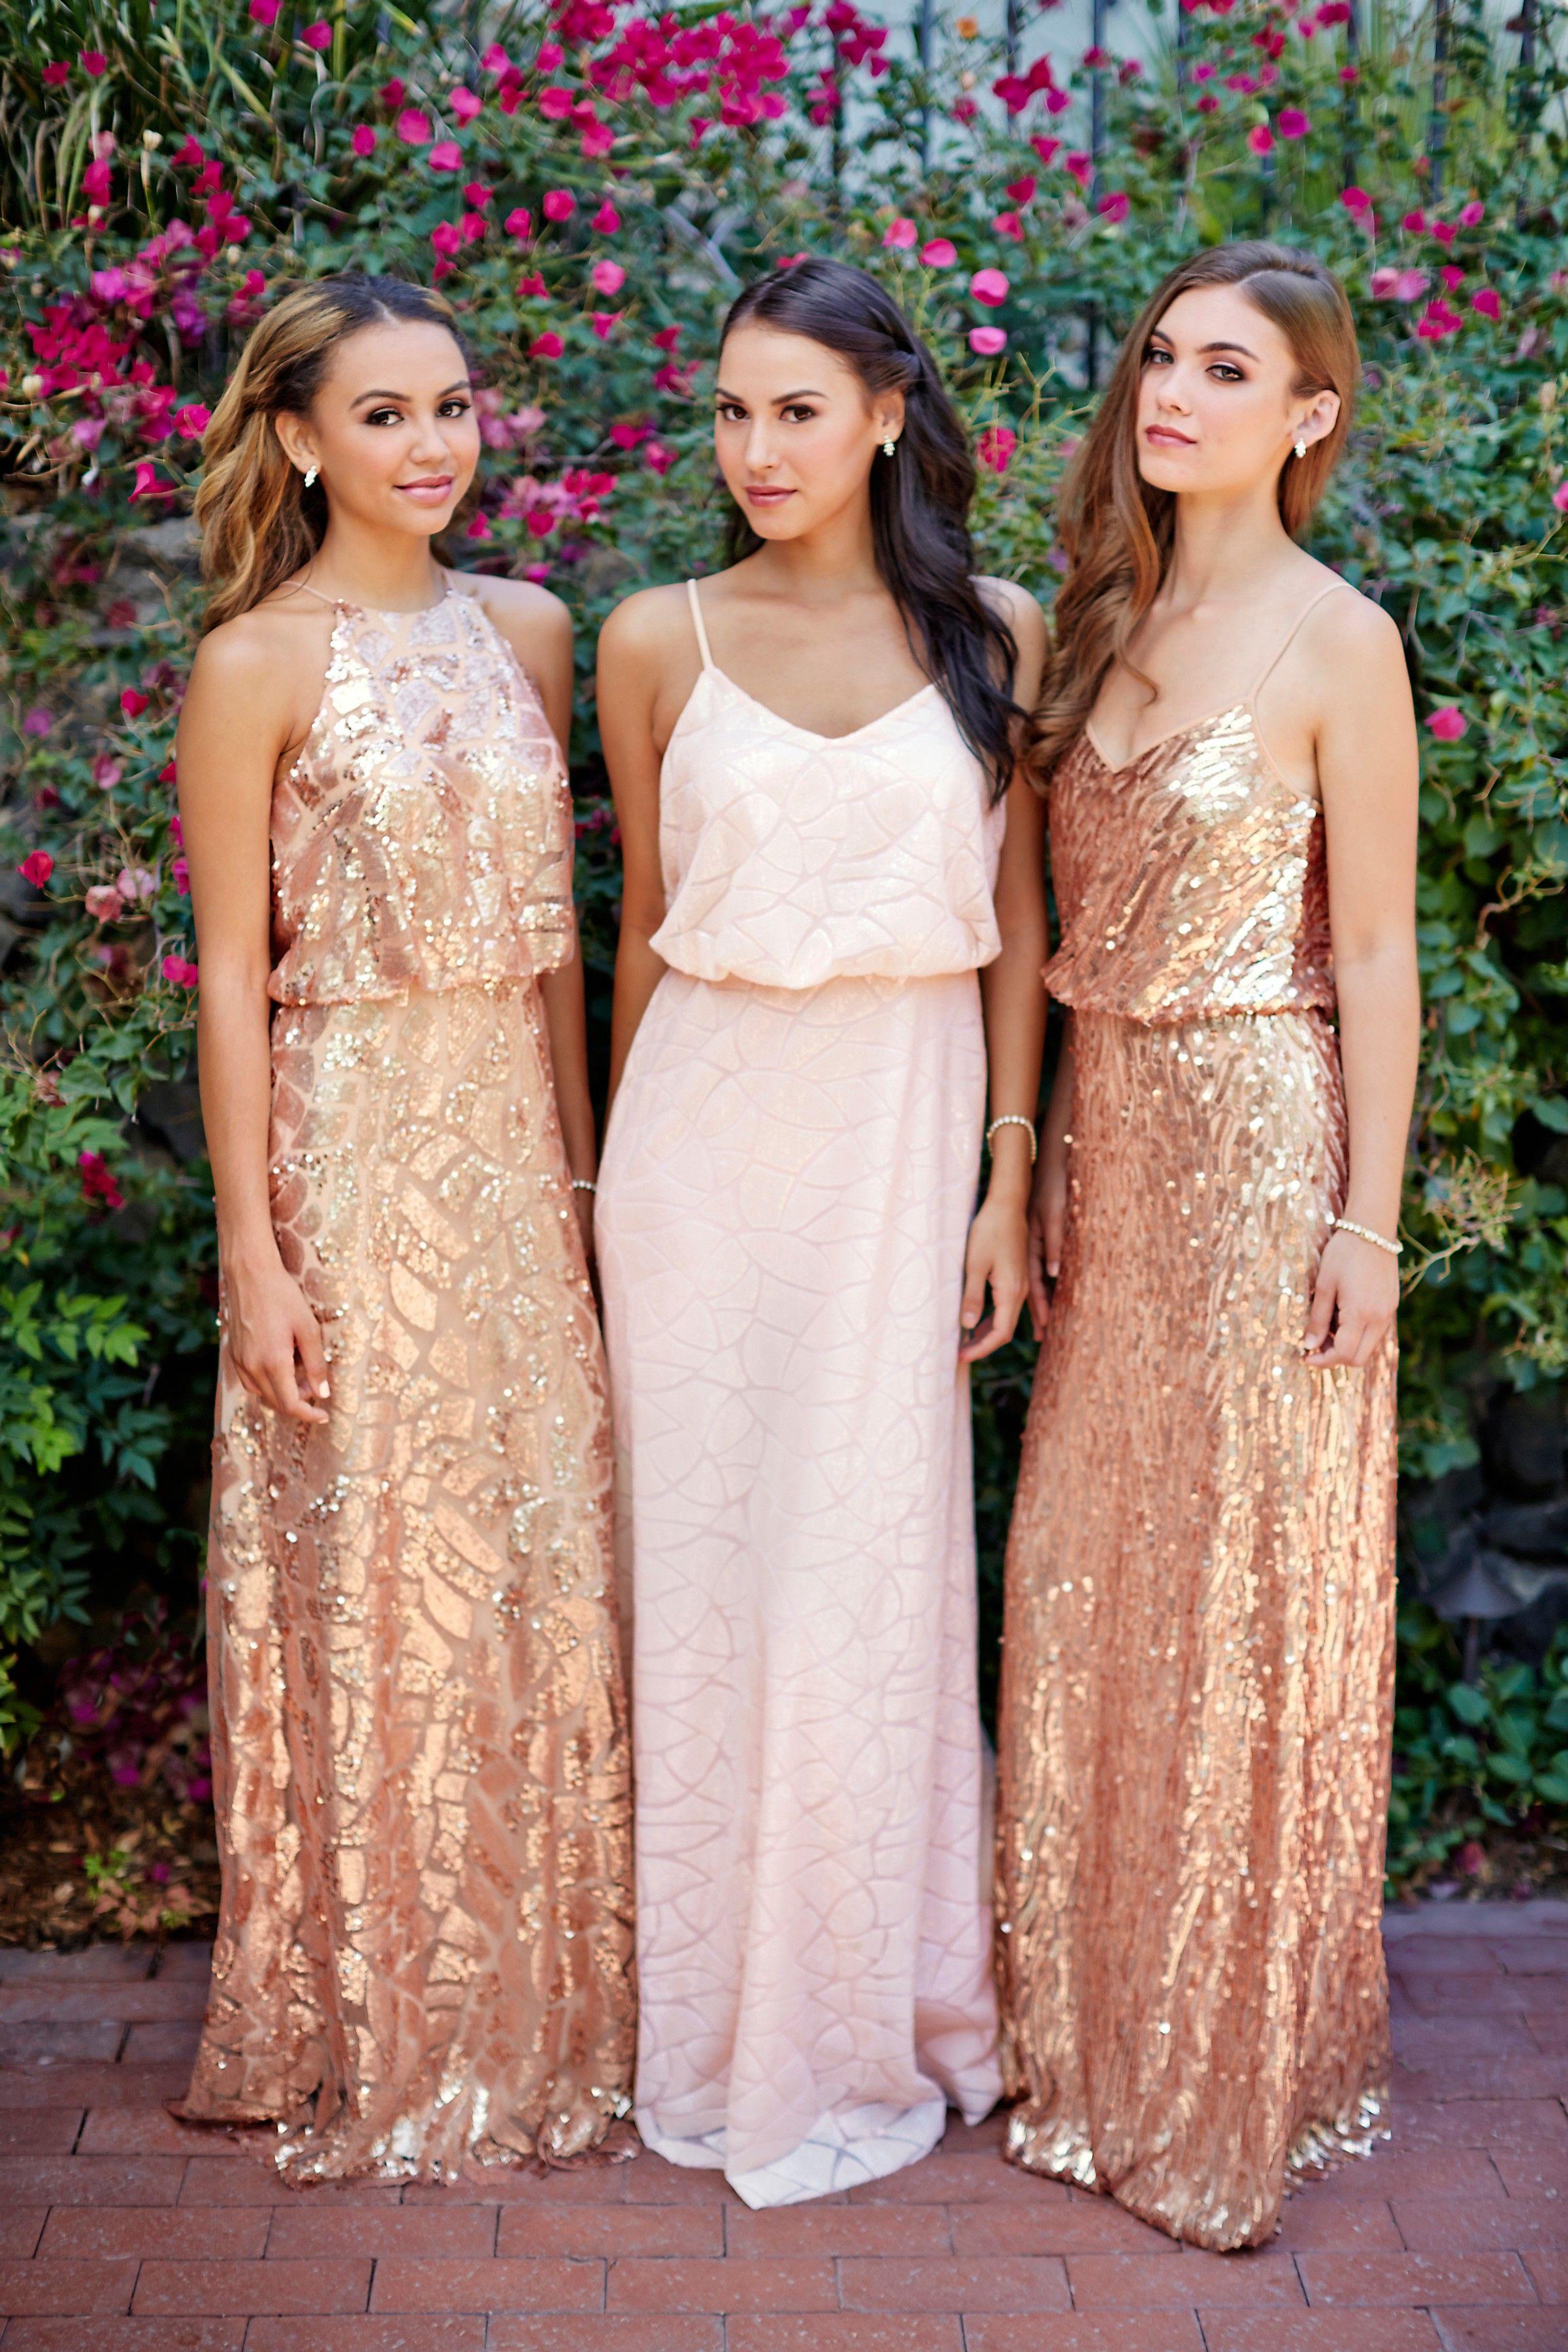 Bridesmaid dresses can it be true jk are saying i do bridesmaid dresses ombrellifo Gallery